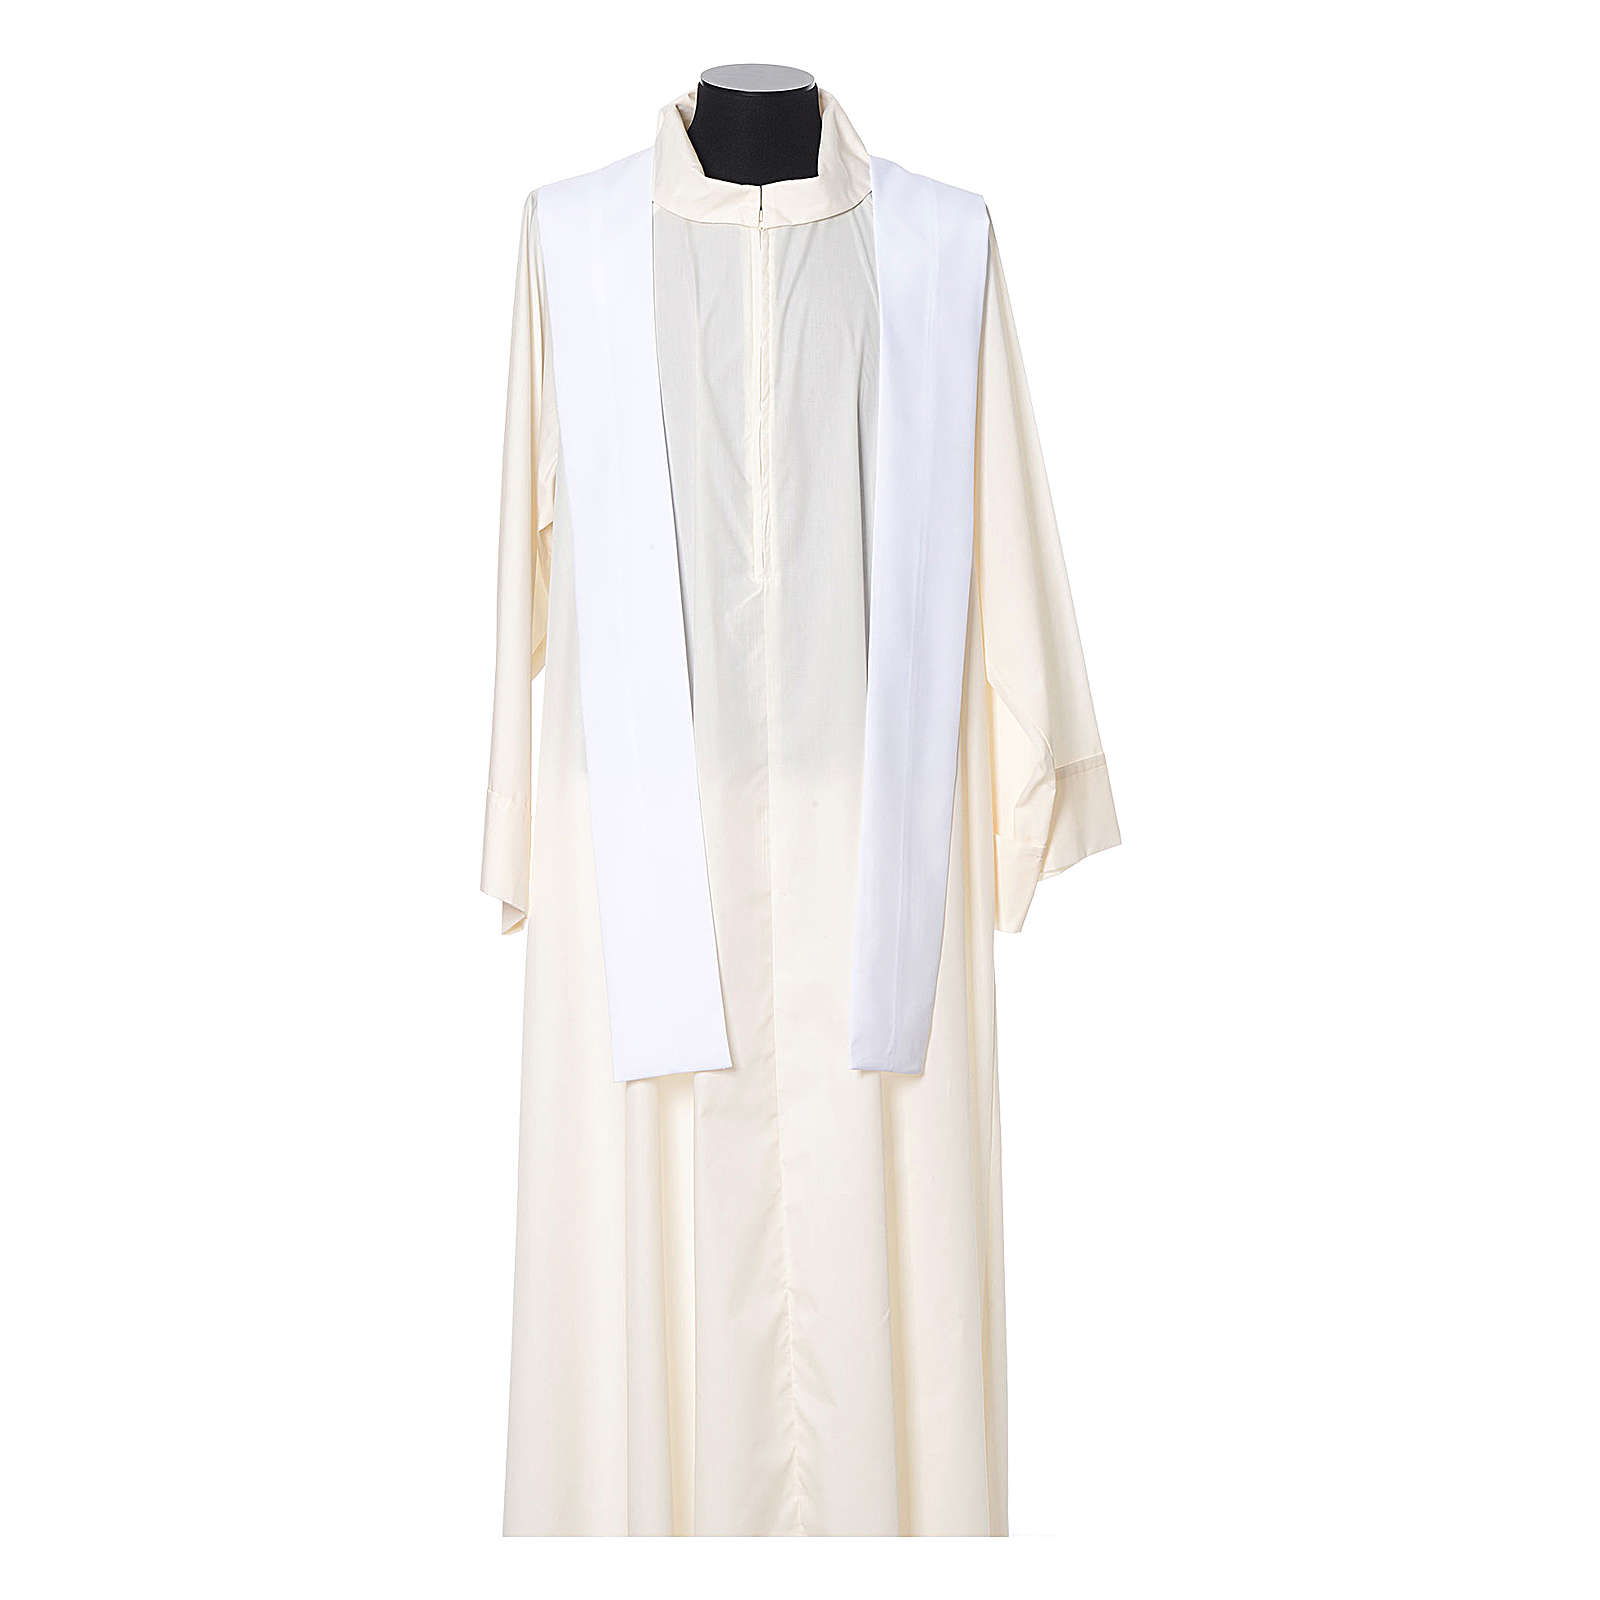 Casula bordo croci davanti tessuto Vatican 100% poliestere 4